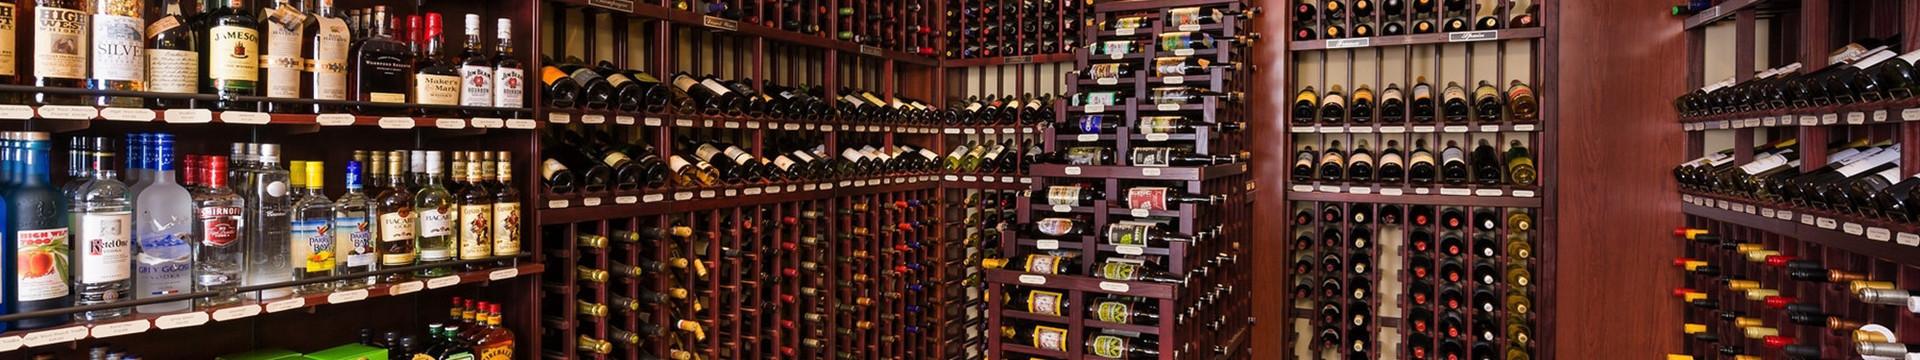 Marketplace in our Park City, Utah Hotel and Ski Resort | Liquor Store